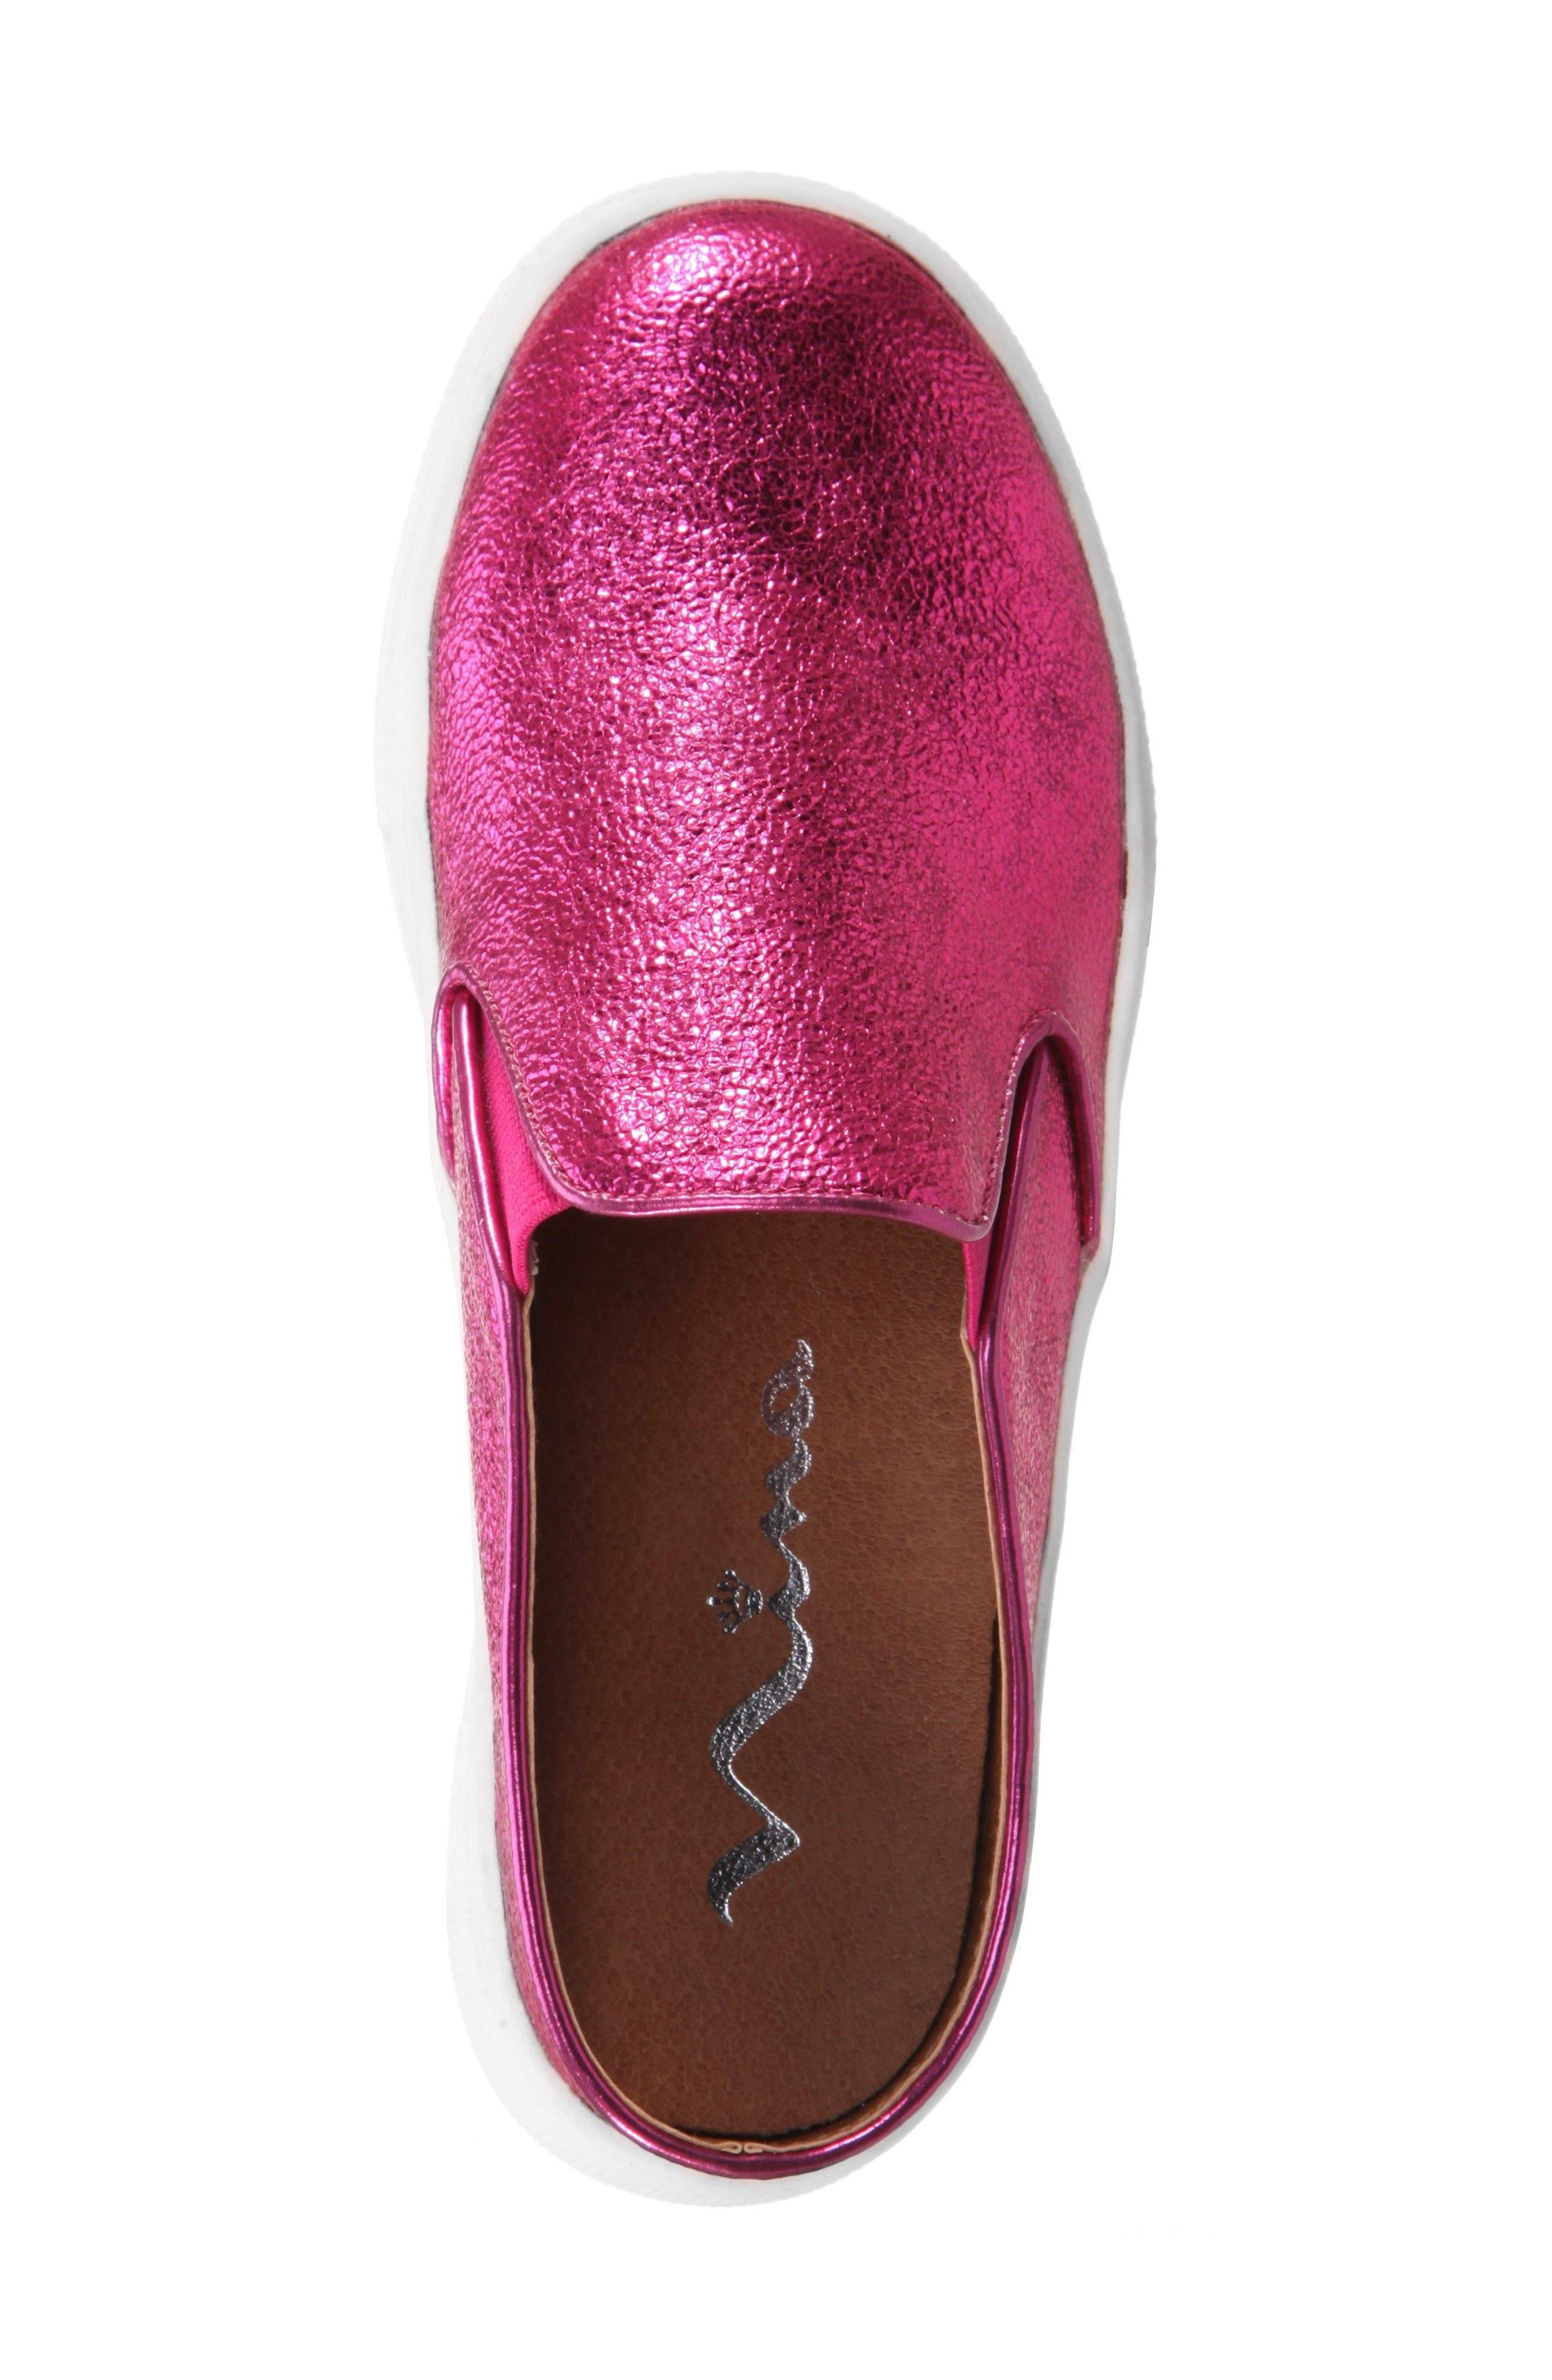 Gail Metallic Slip-On Sneaker Mule,                             Alternate thumbnail 4, color,                             Pink Metallic Crackle